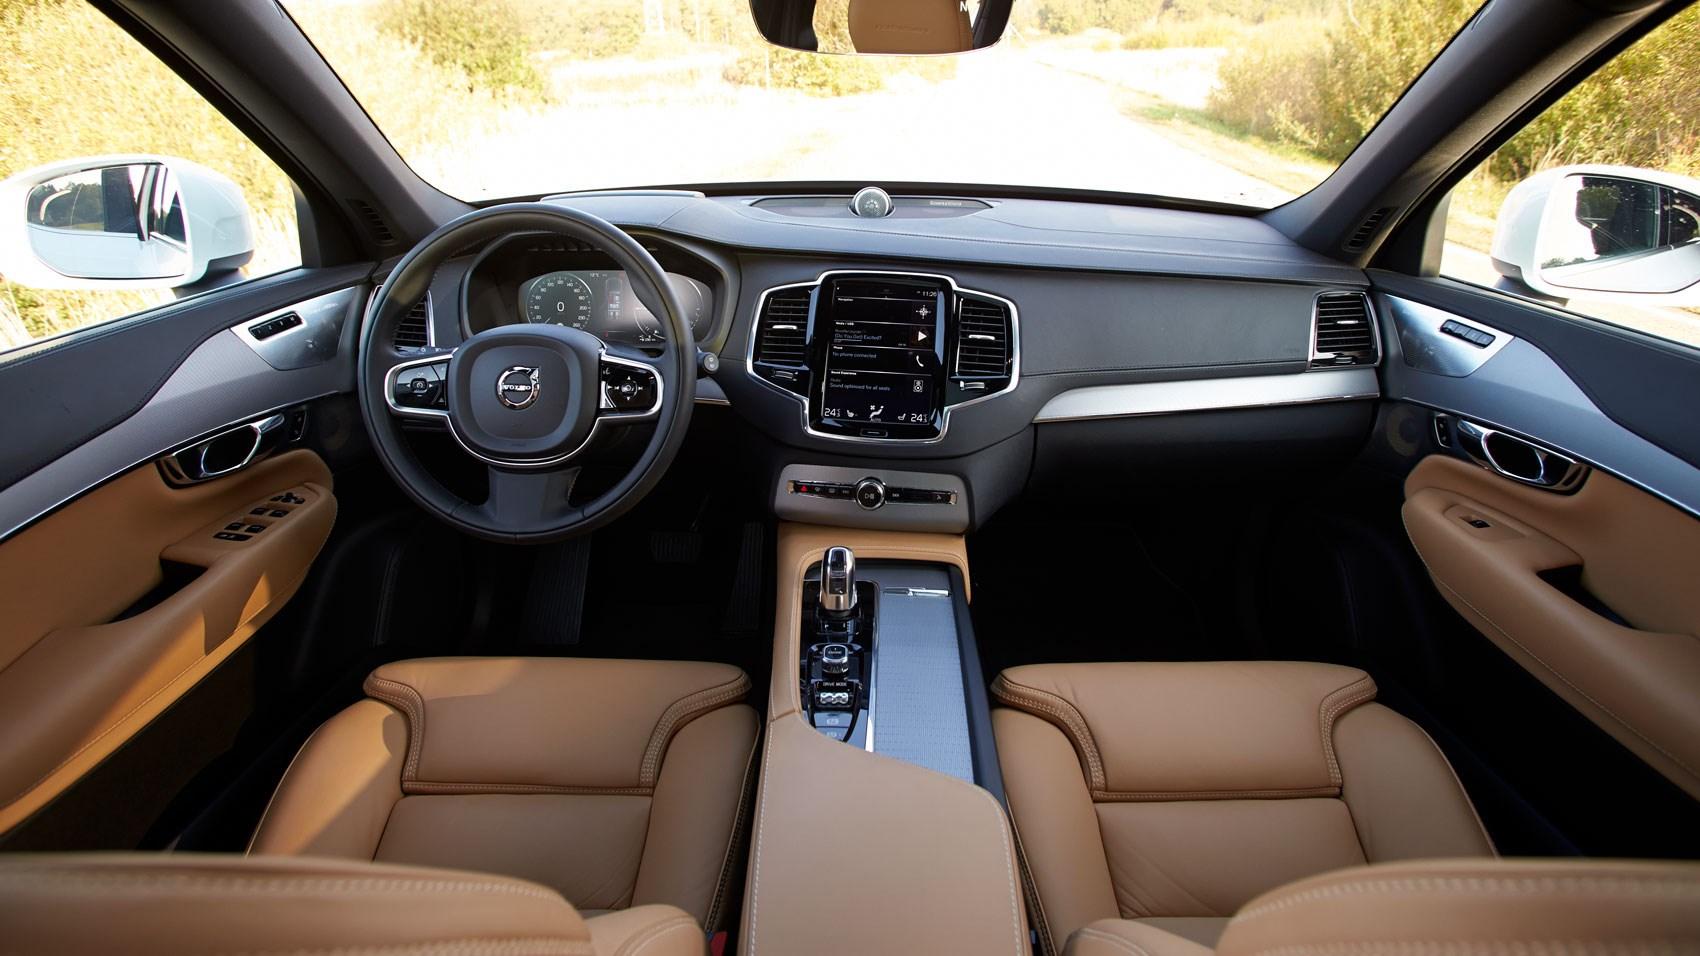 Volvo XC90 T8 Twin Engine (2016) review | CAR Magazine